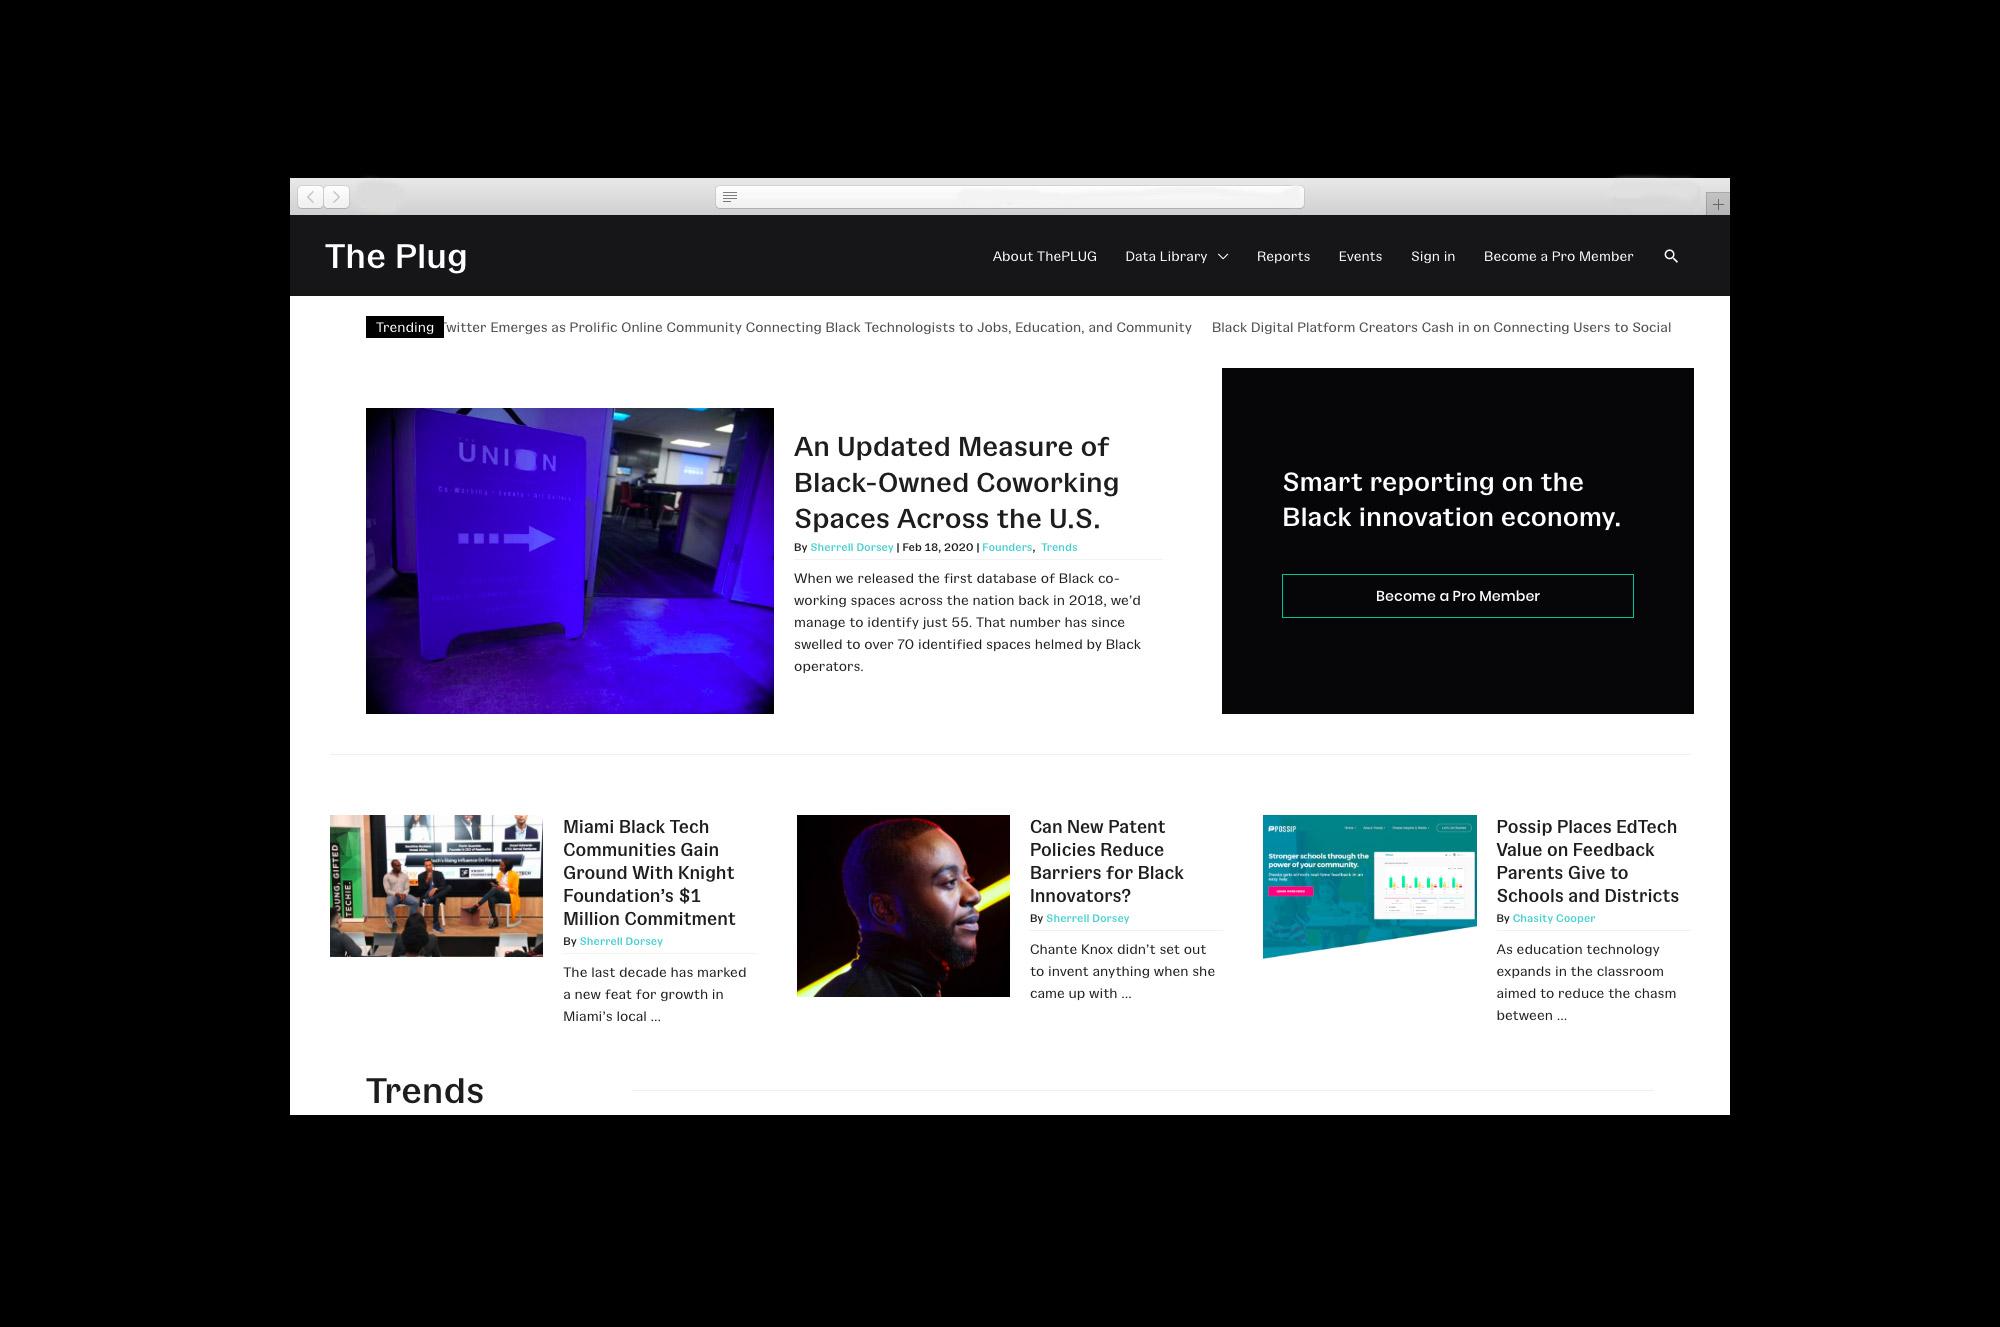 PatentVentures-CaseStudy-ThePlug-11